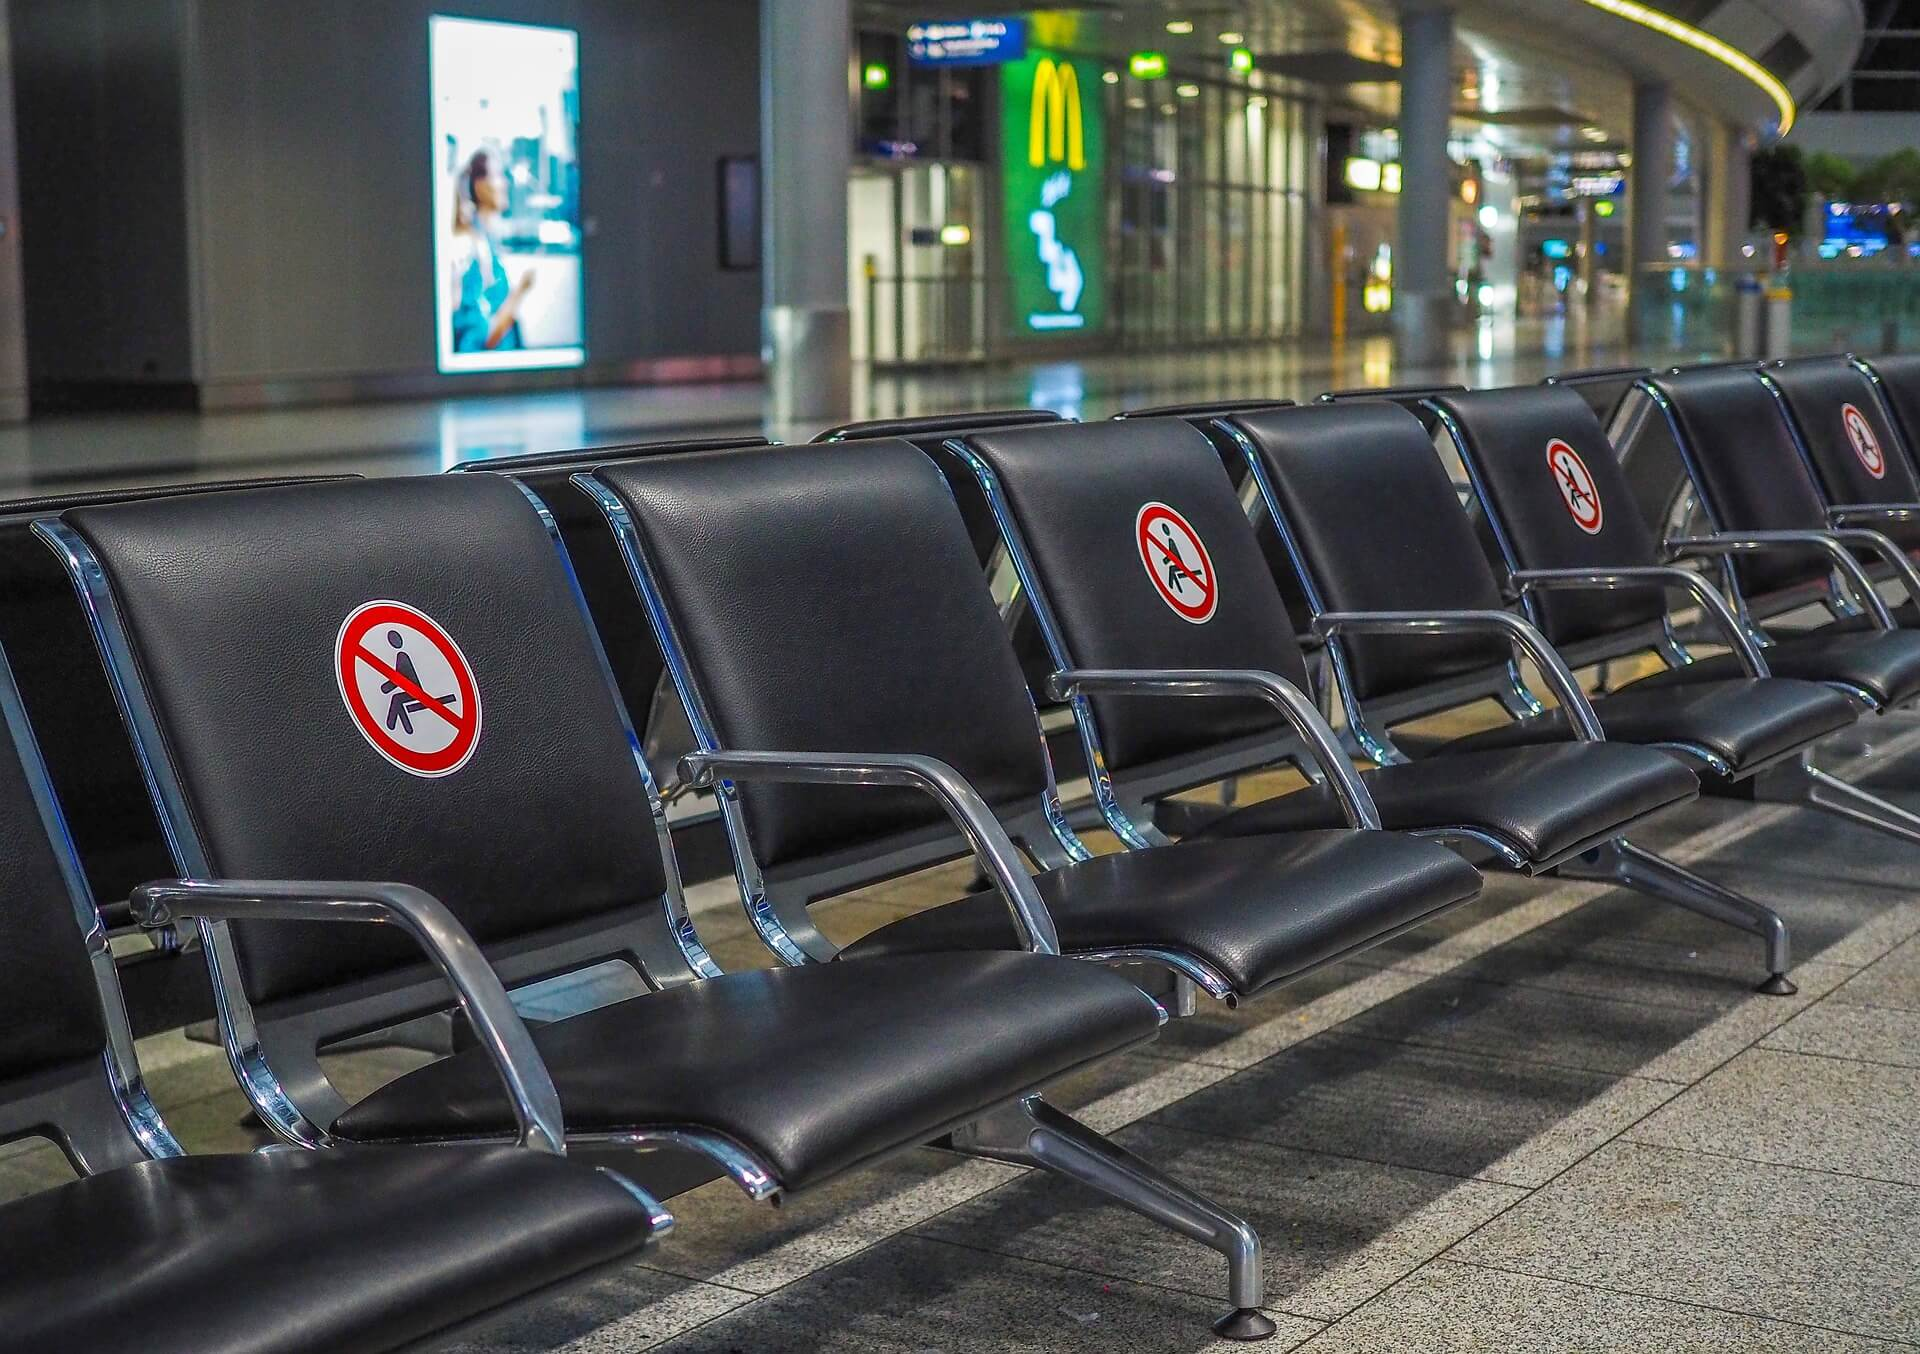 airport ground operations, aircraft, aviation, pandemic, telematics, fleet